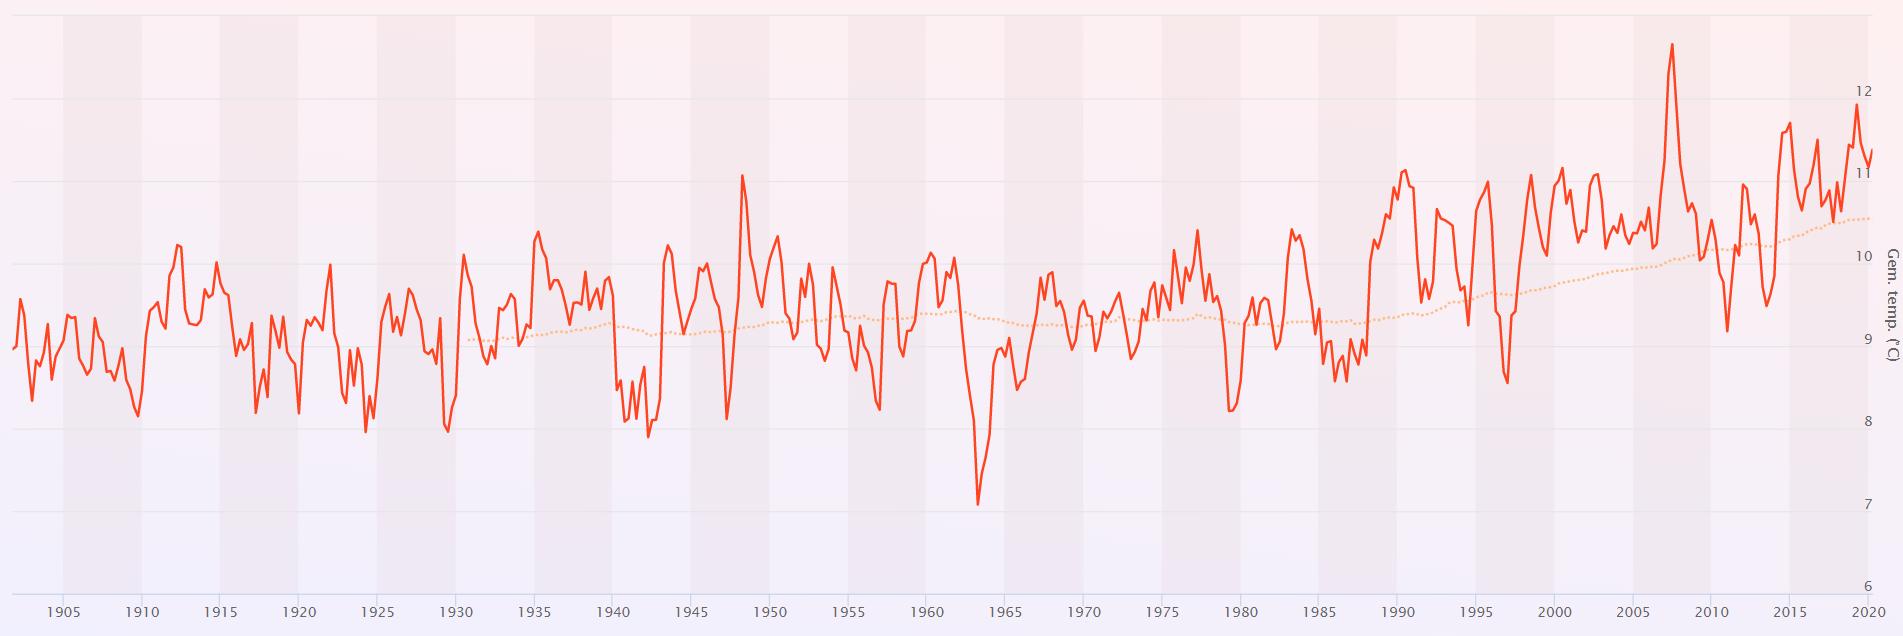 Klimaatverandering in Nederland vanaf 1901